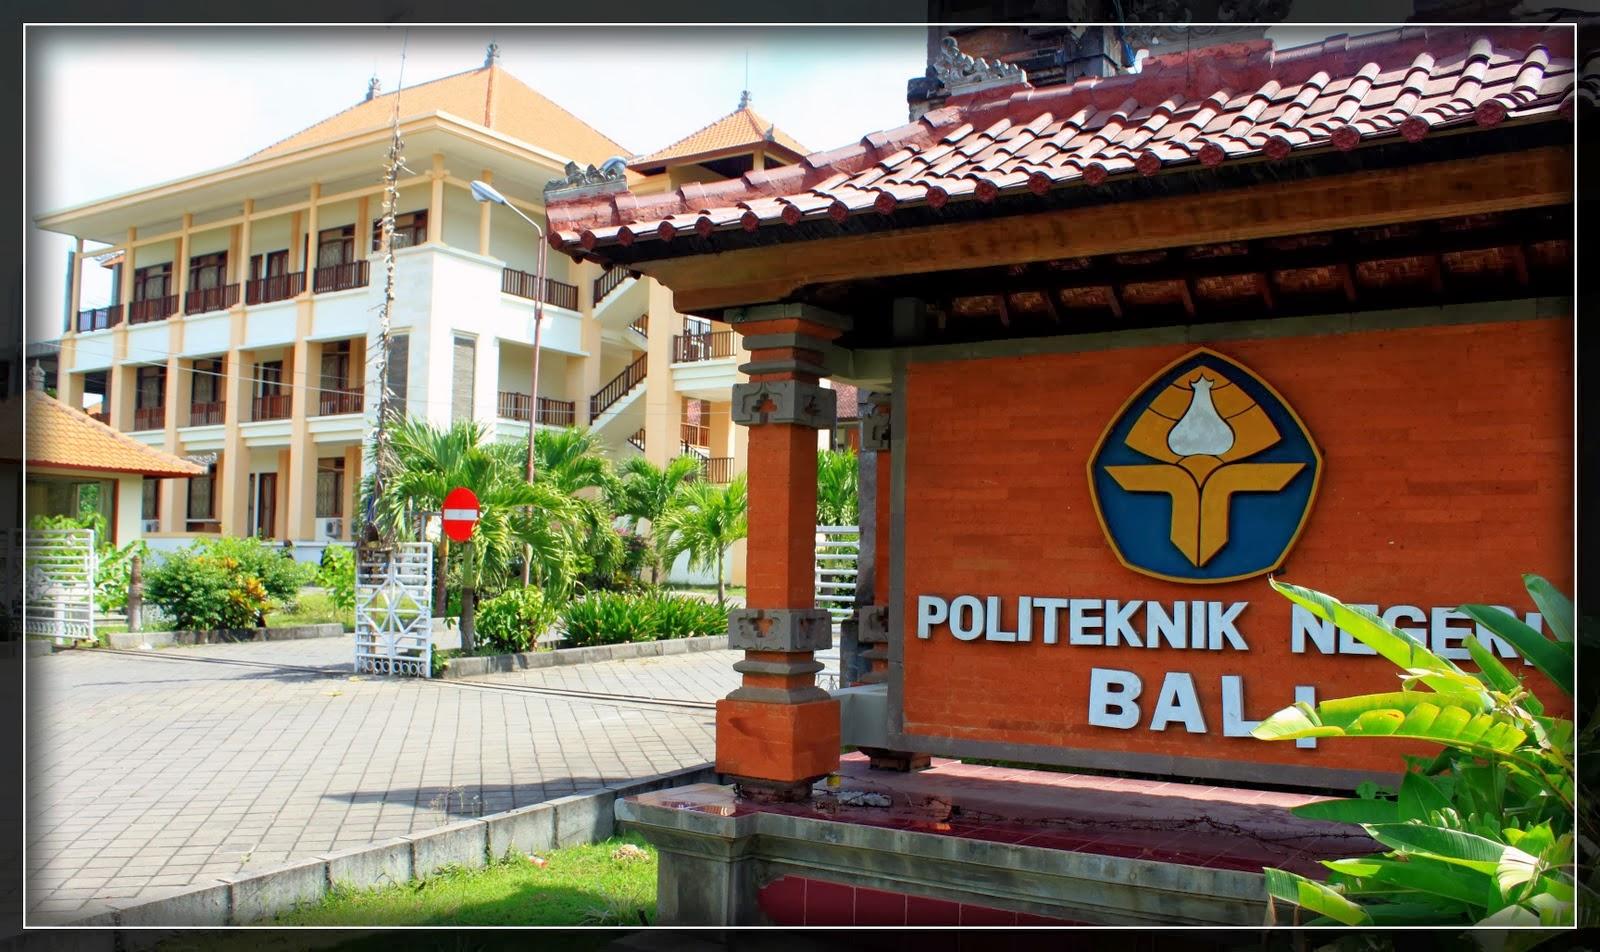 Jurusan PNB Politeknik Negeri Bali dan Akreditasinya 2019/2020